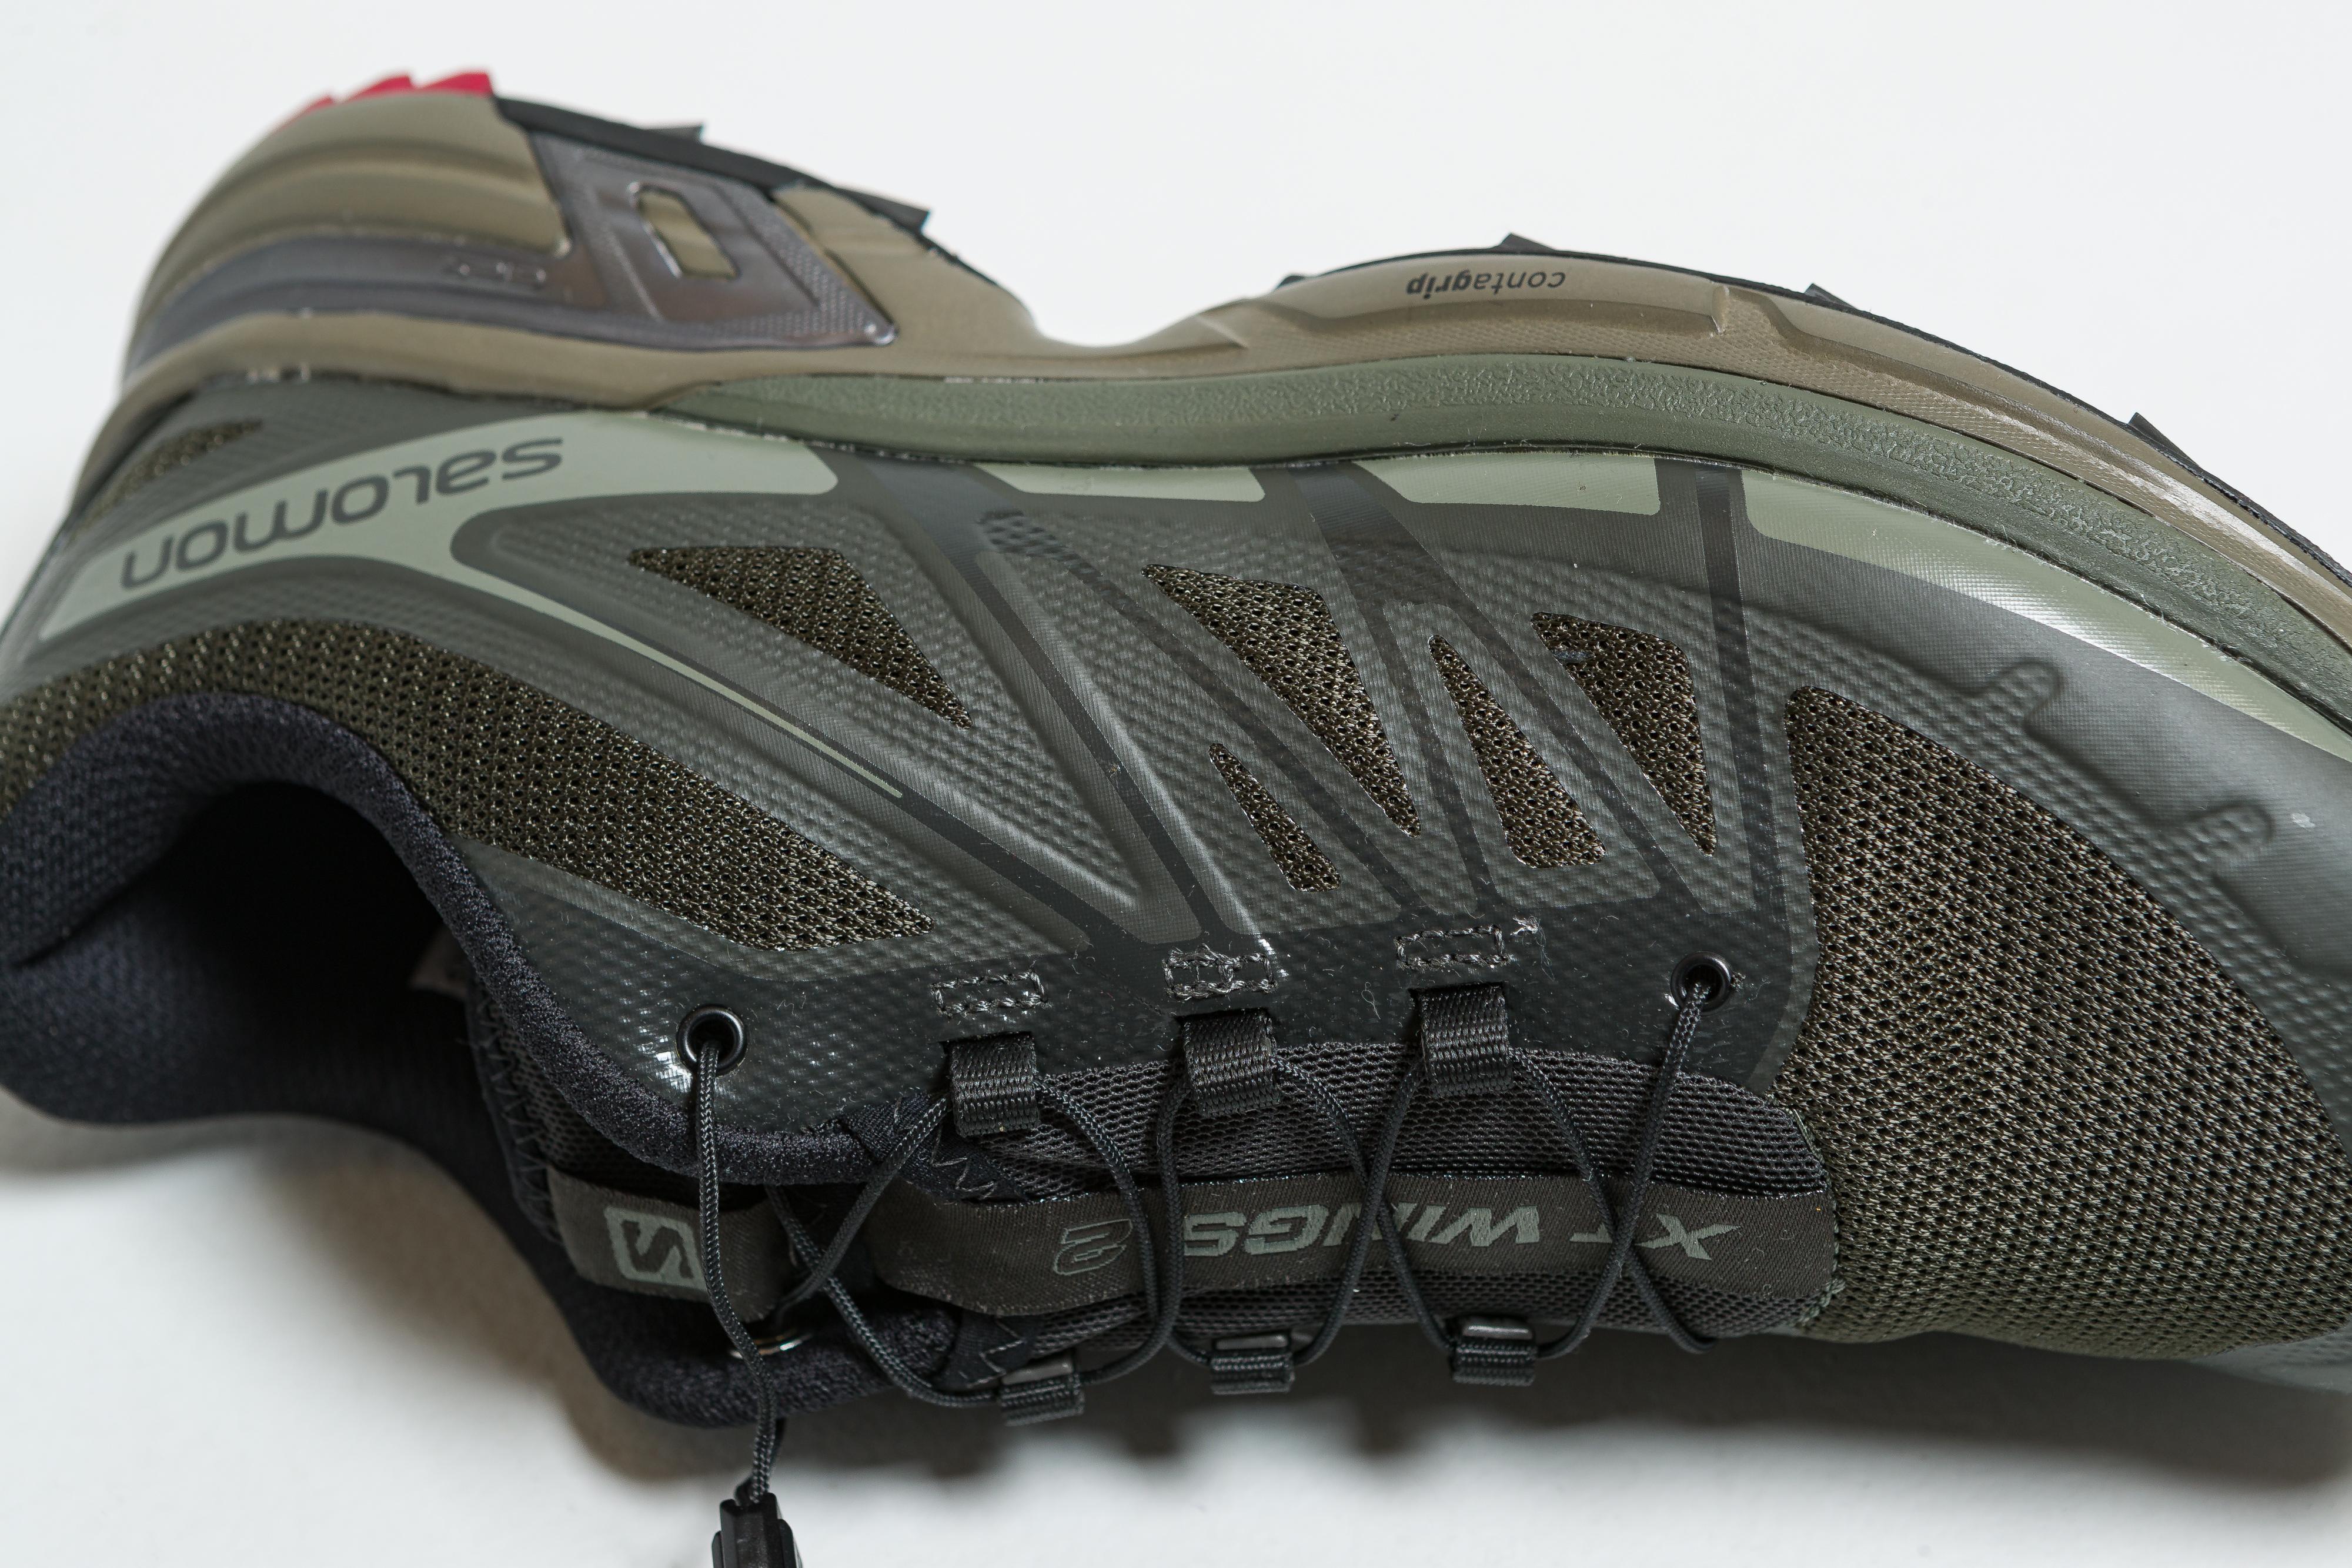 Up There Store - Salomon Advanced FW21 Fall/Winter 21' XT-Wings 2, XT-6, Odyssey 1, Speedcross 3